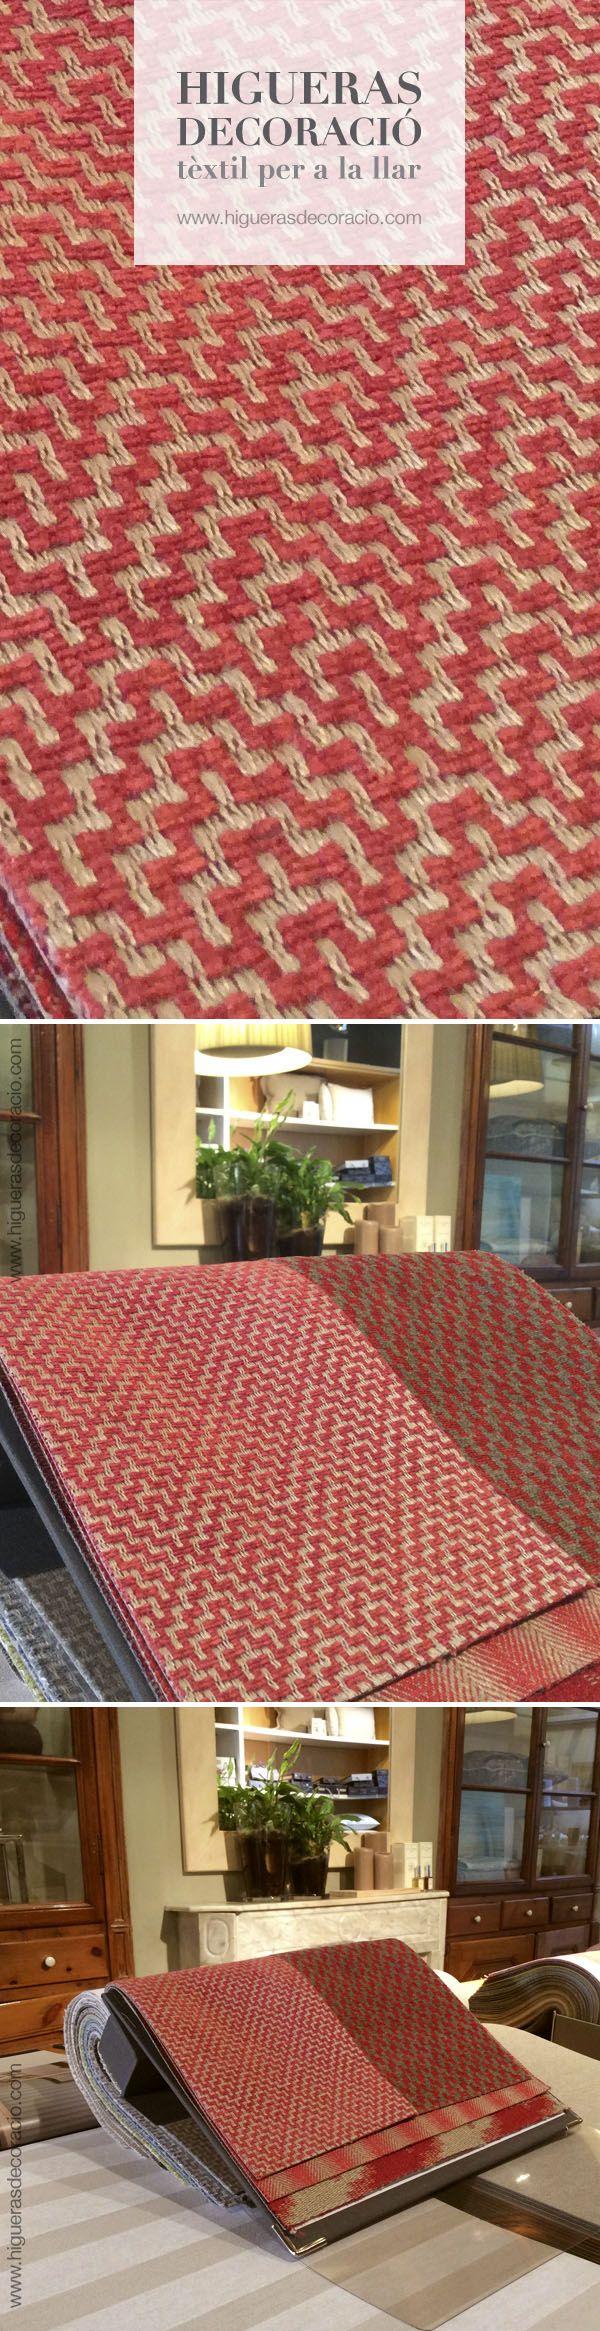 M s de 1000 ideas sobre tela para pared en pinterest - Cabezales de tela ...